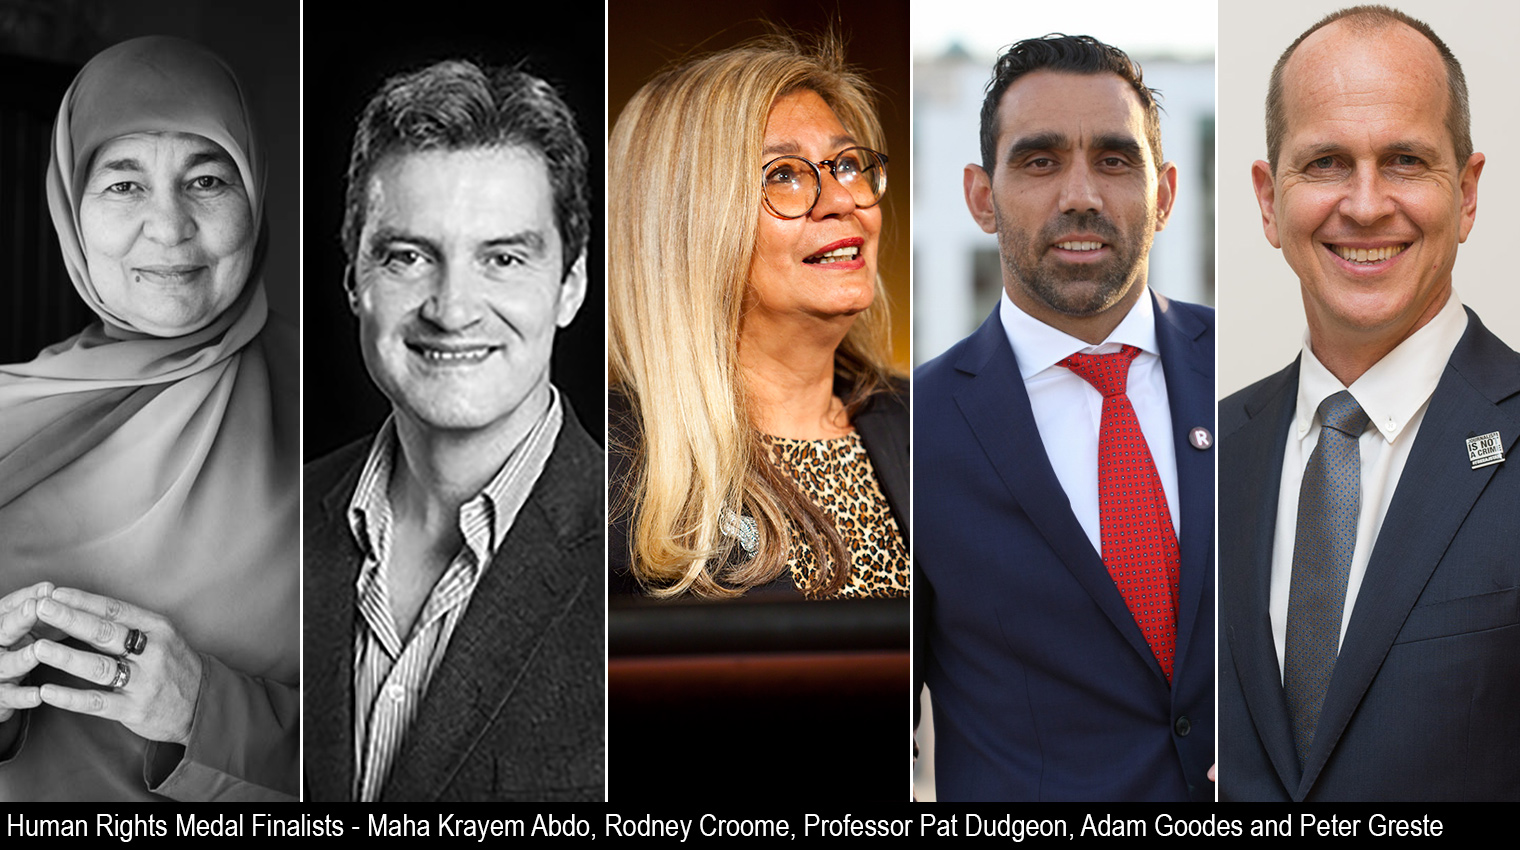 Human Rights Medal Finalists - Maha Krayem Abdo, Rodney Croome, Professor Pat Dudgeon, Adam Goodes and Peter Greste